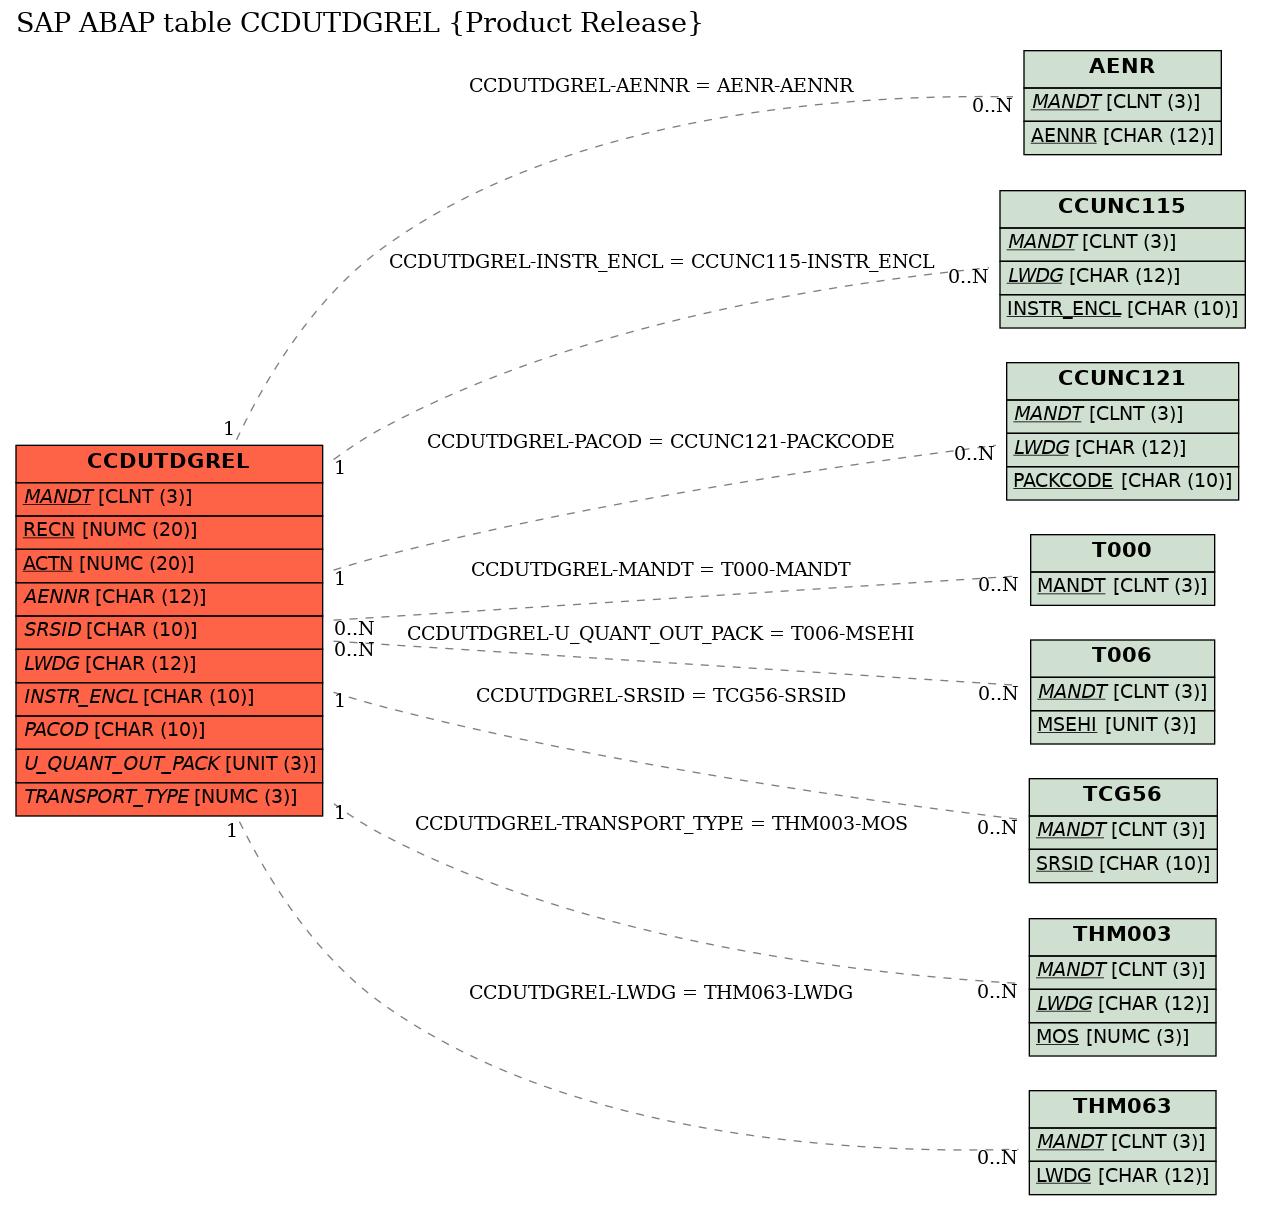 E-R Diagram for table CCDUTDGREL (Product Release)